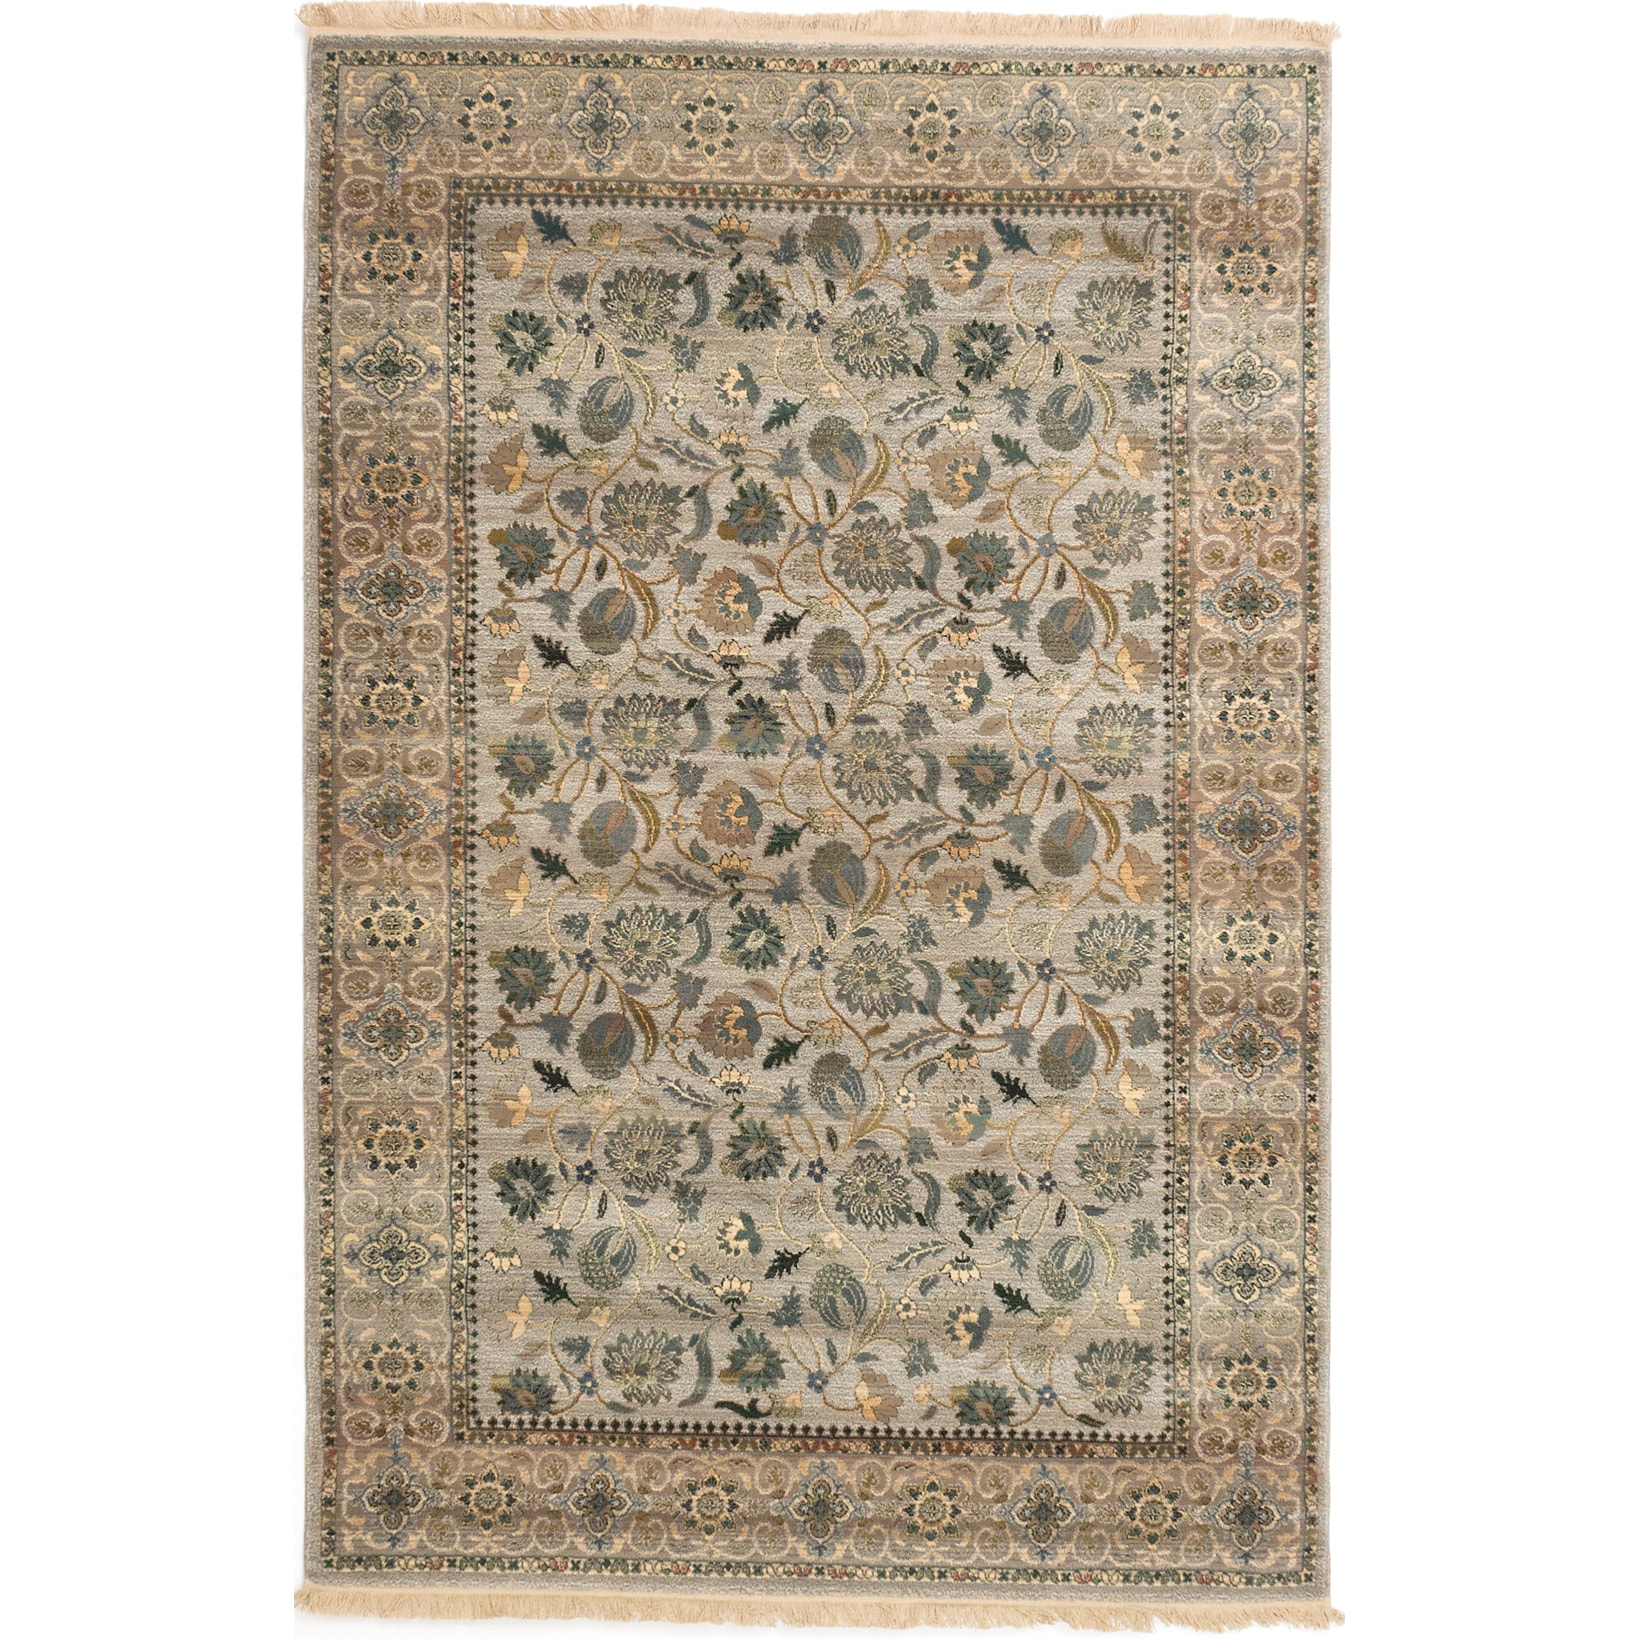 Ecarpetgallery Tekke Bokhara Grey Handmade Rug (5'4x8') (...